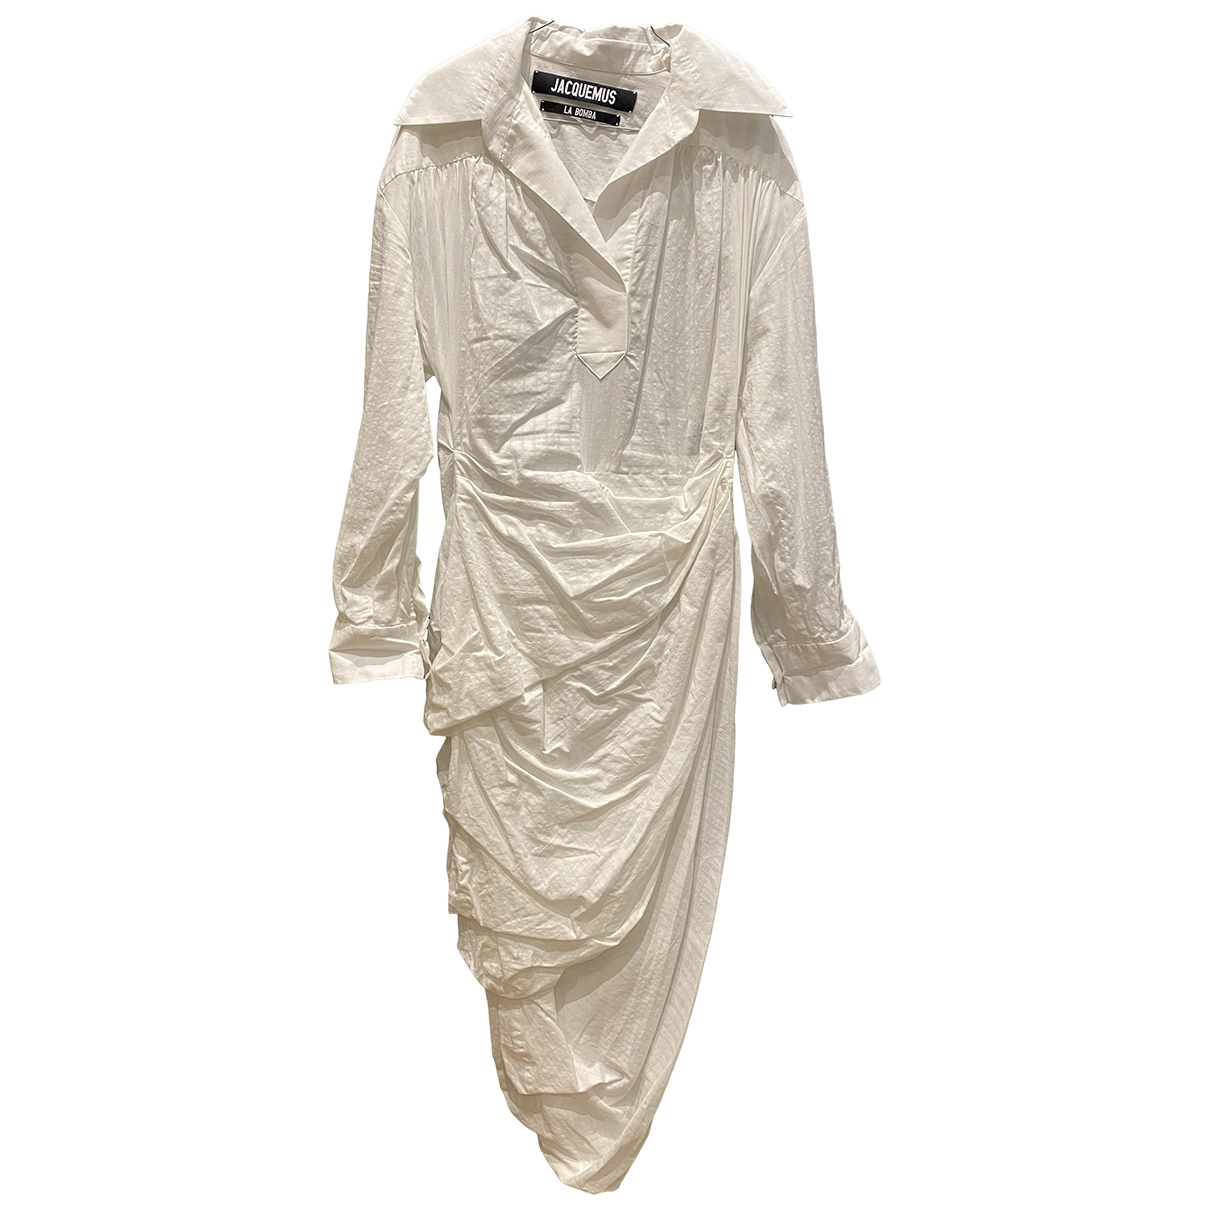 Jacquemus La Bomba White Cotton dress for Women 38 FR